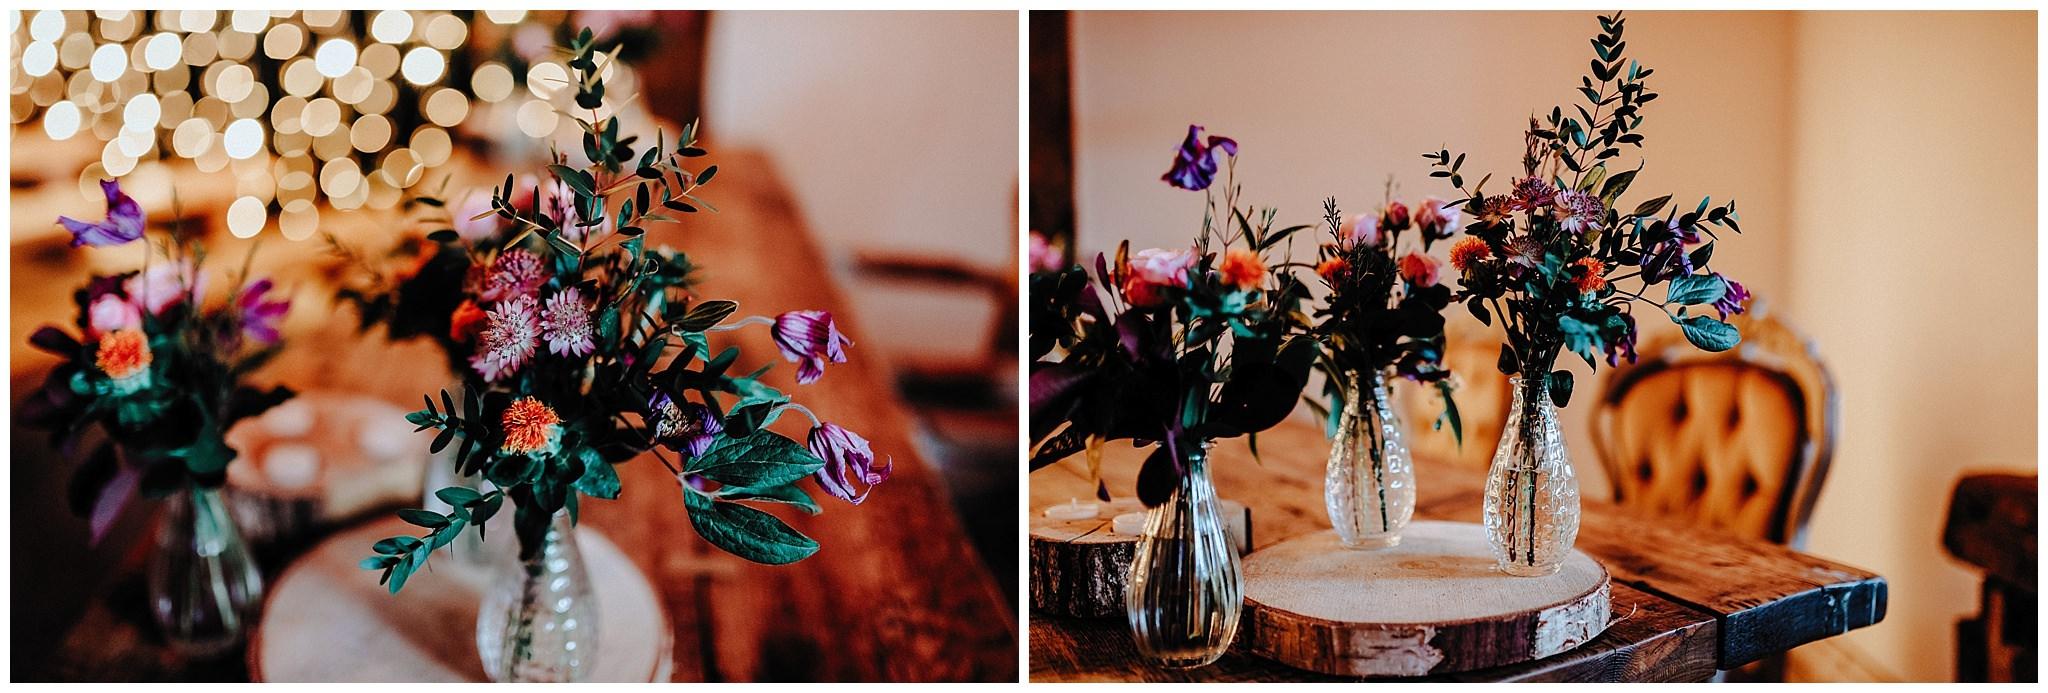 Owen-House-Wedding-Barn-Photography-81